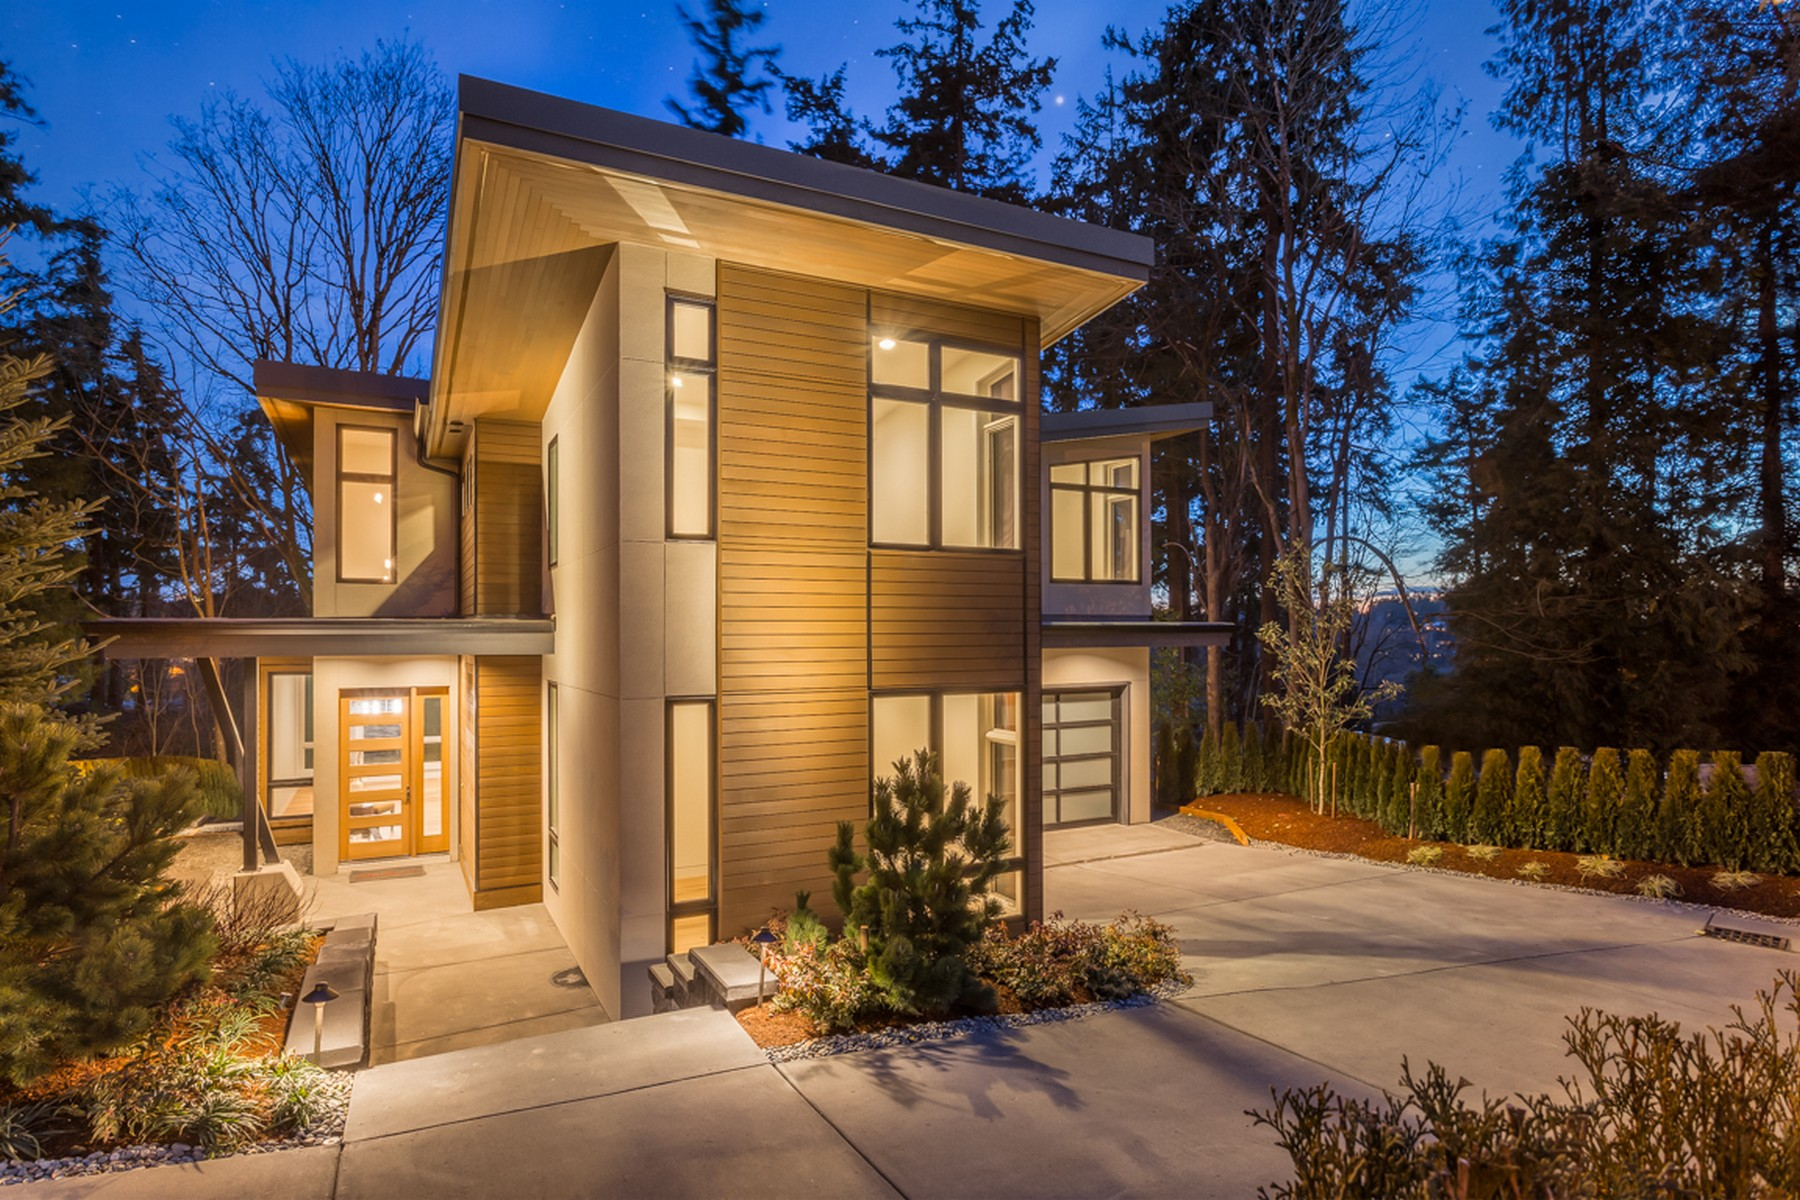 Single Family Home for Sale at Portofino Lot 5 10405 NE 43rd St. Kirkland, Washington 98033 United States